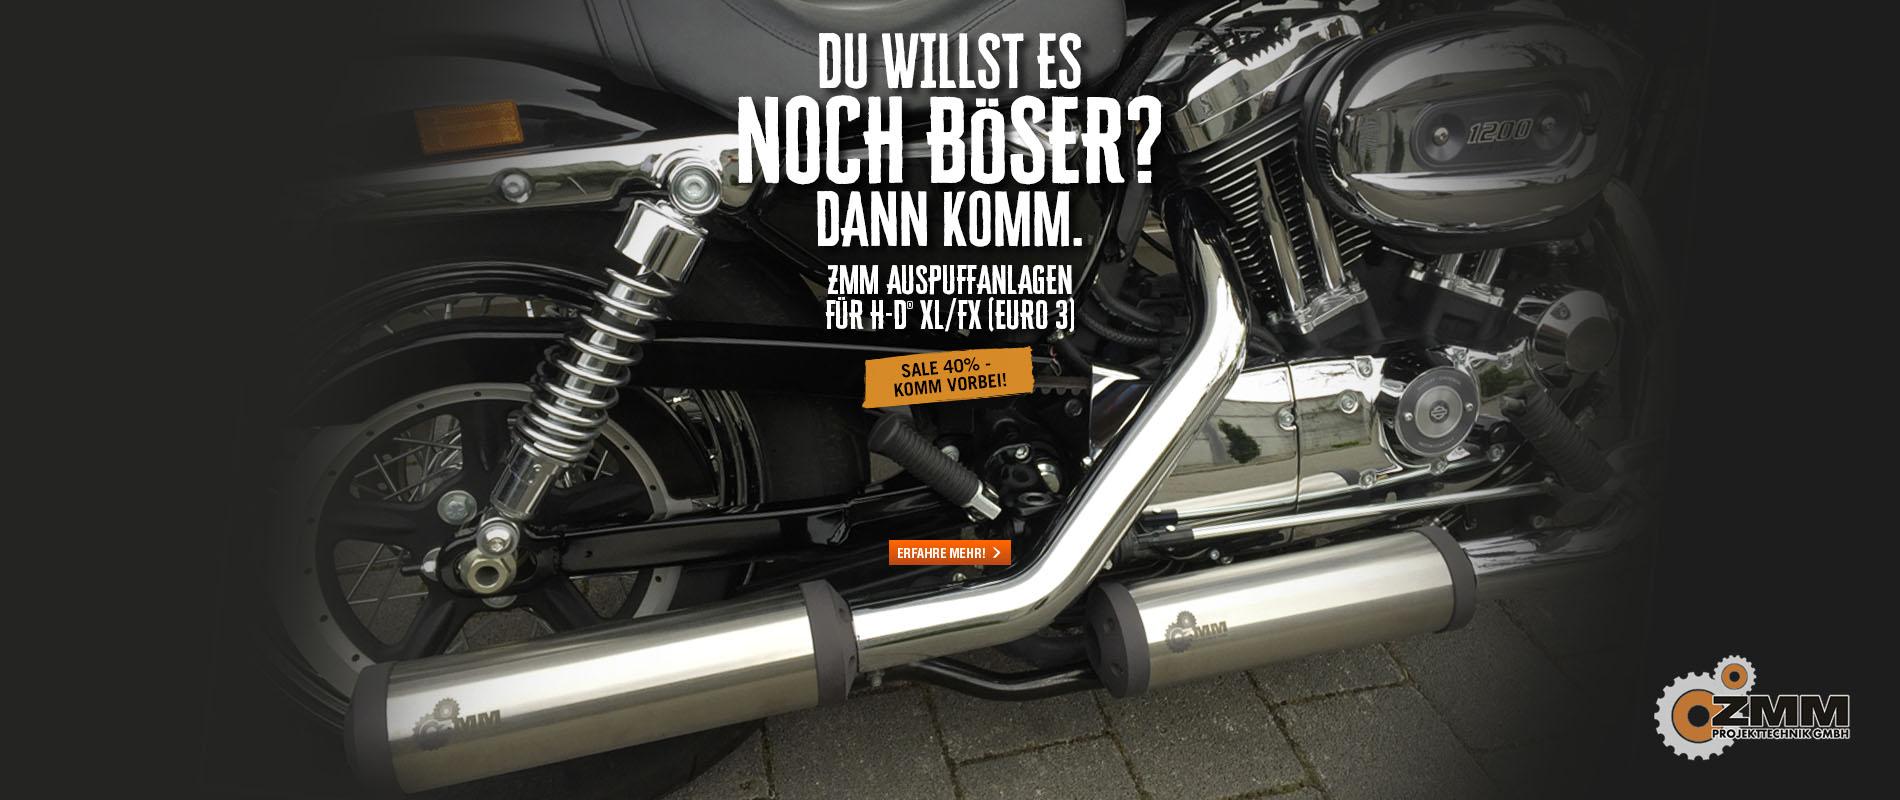 HD_Regensburg_Billboard_SliponAuspuff_Sale